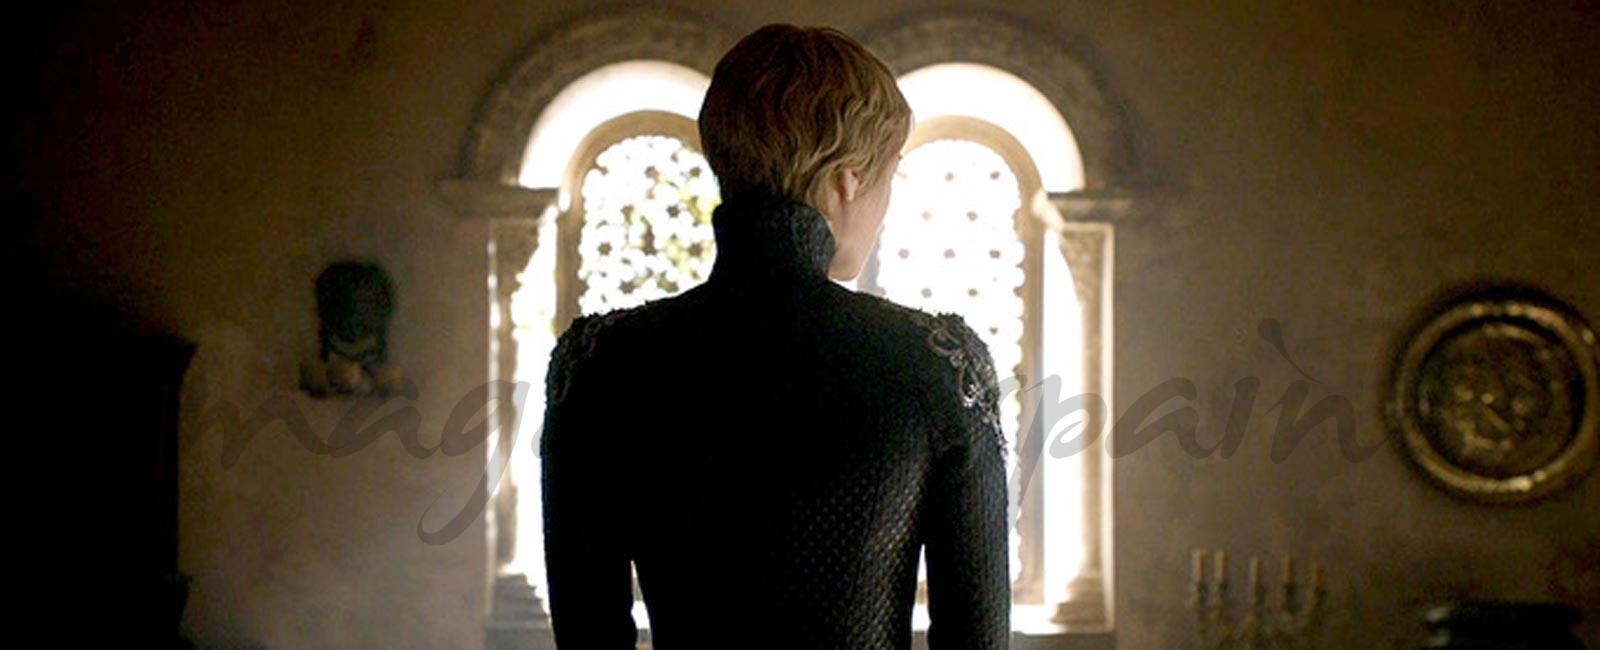 Juego de Tronos © HBO